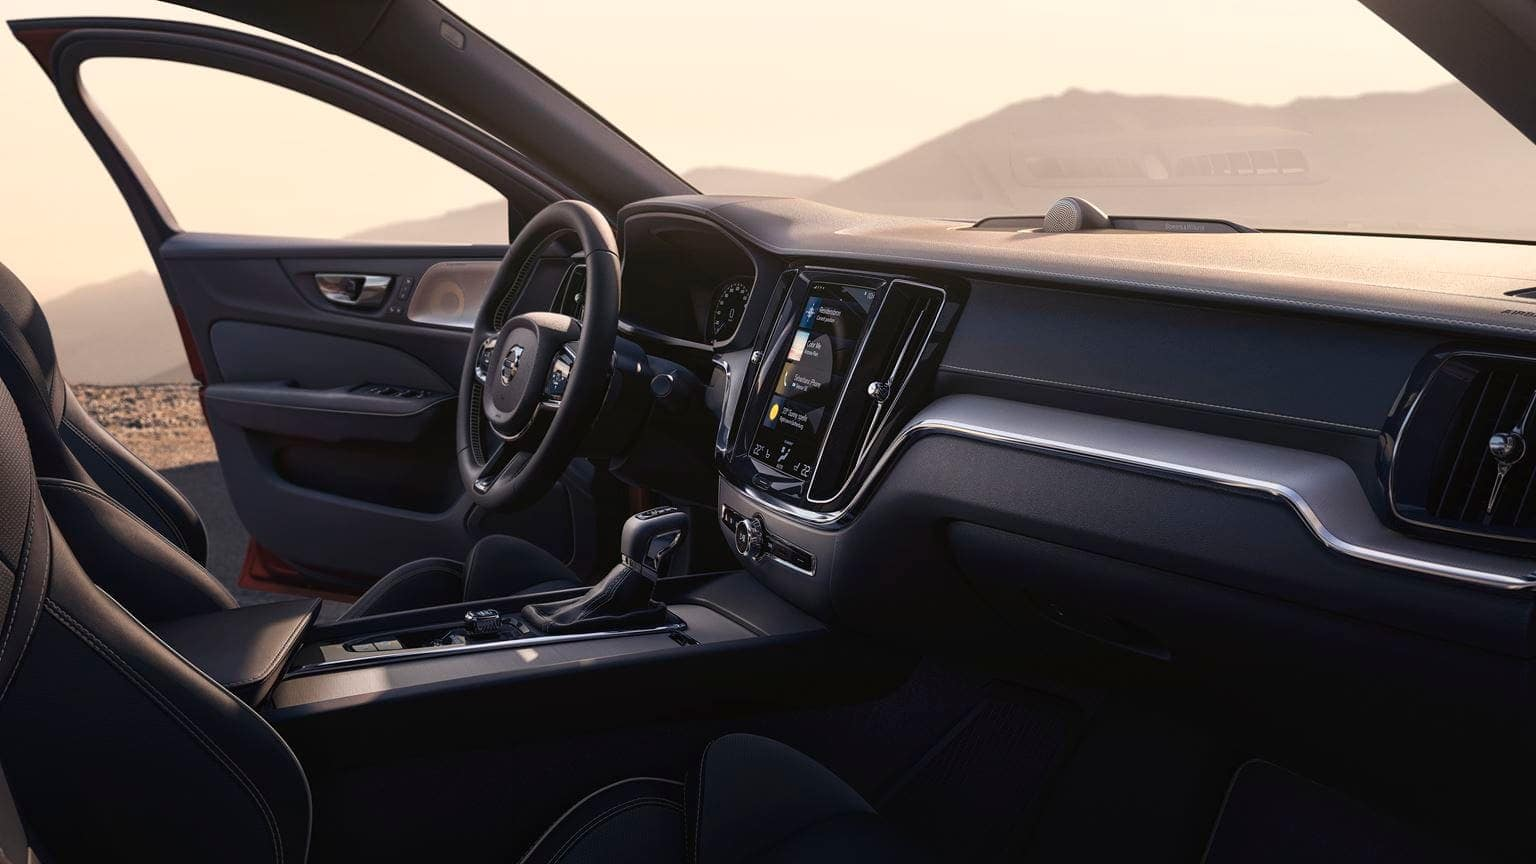 2019 Volvo S60 interior in black leather